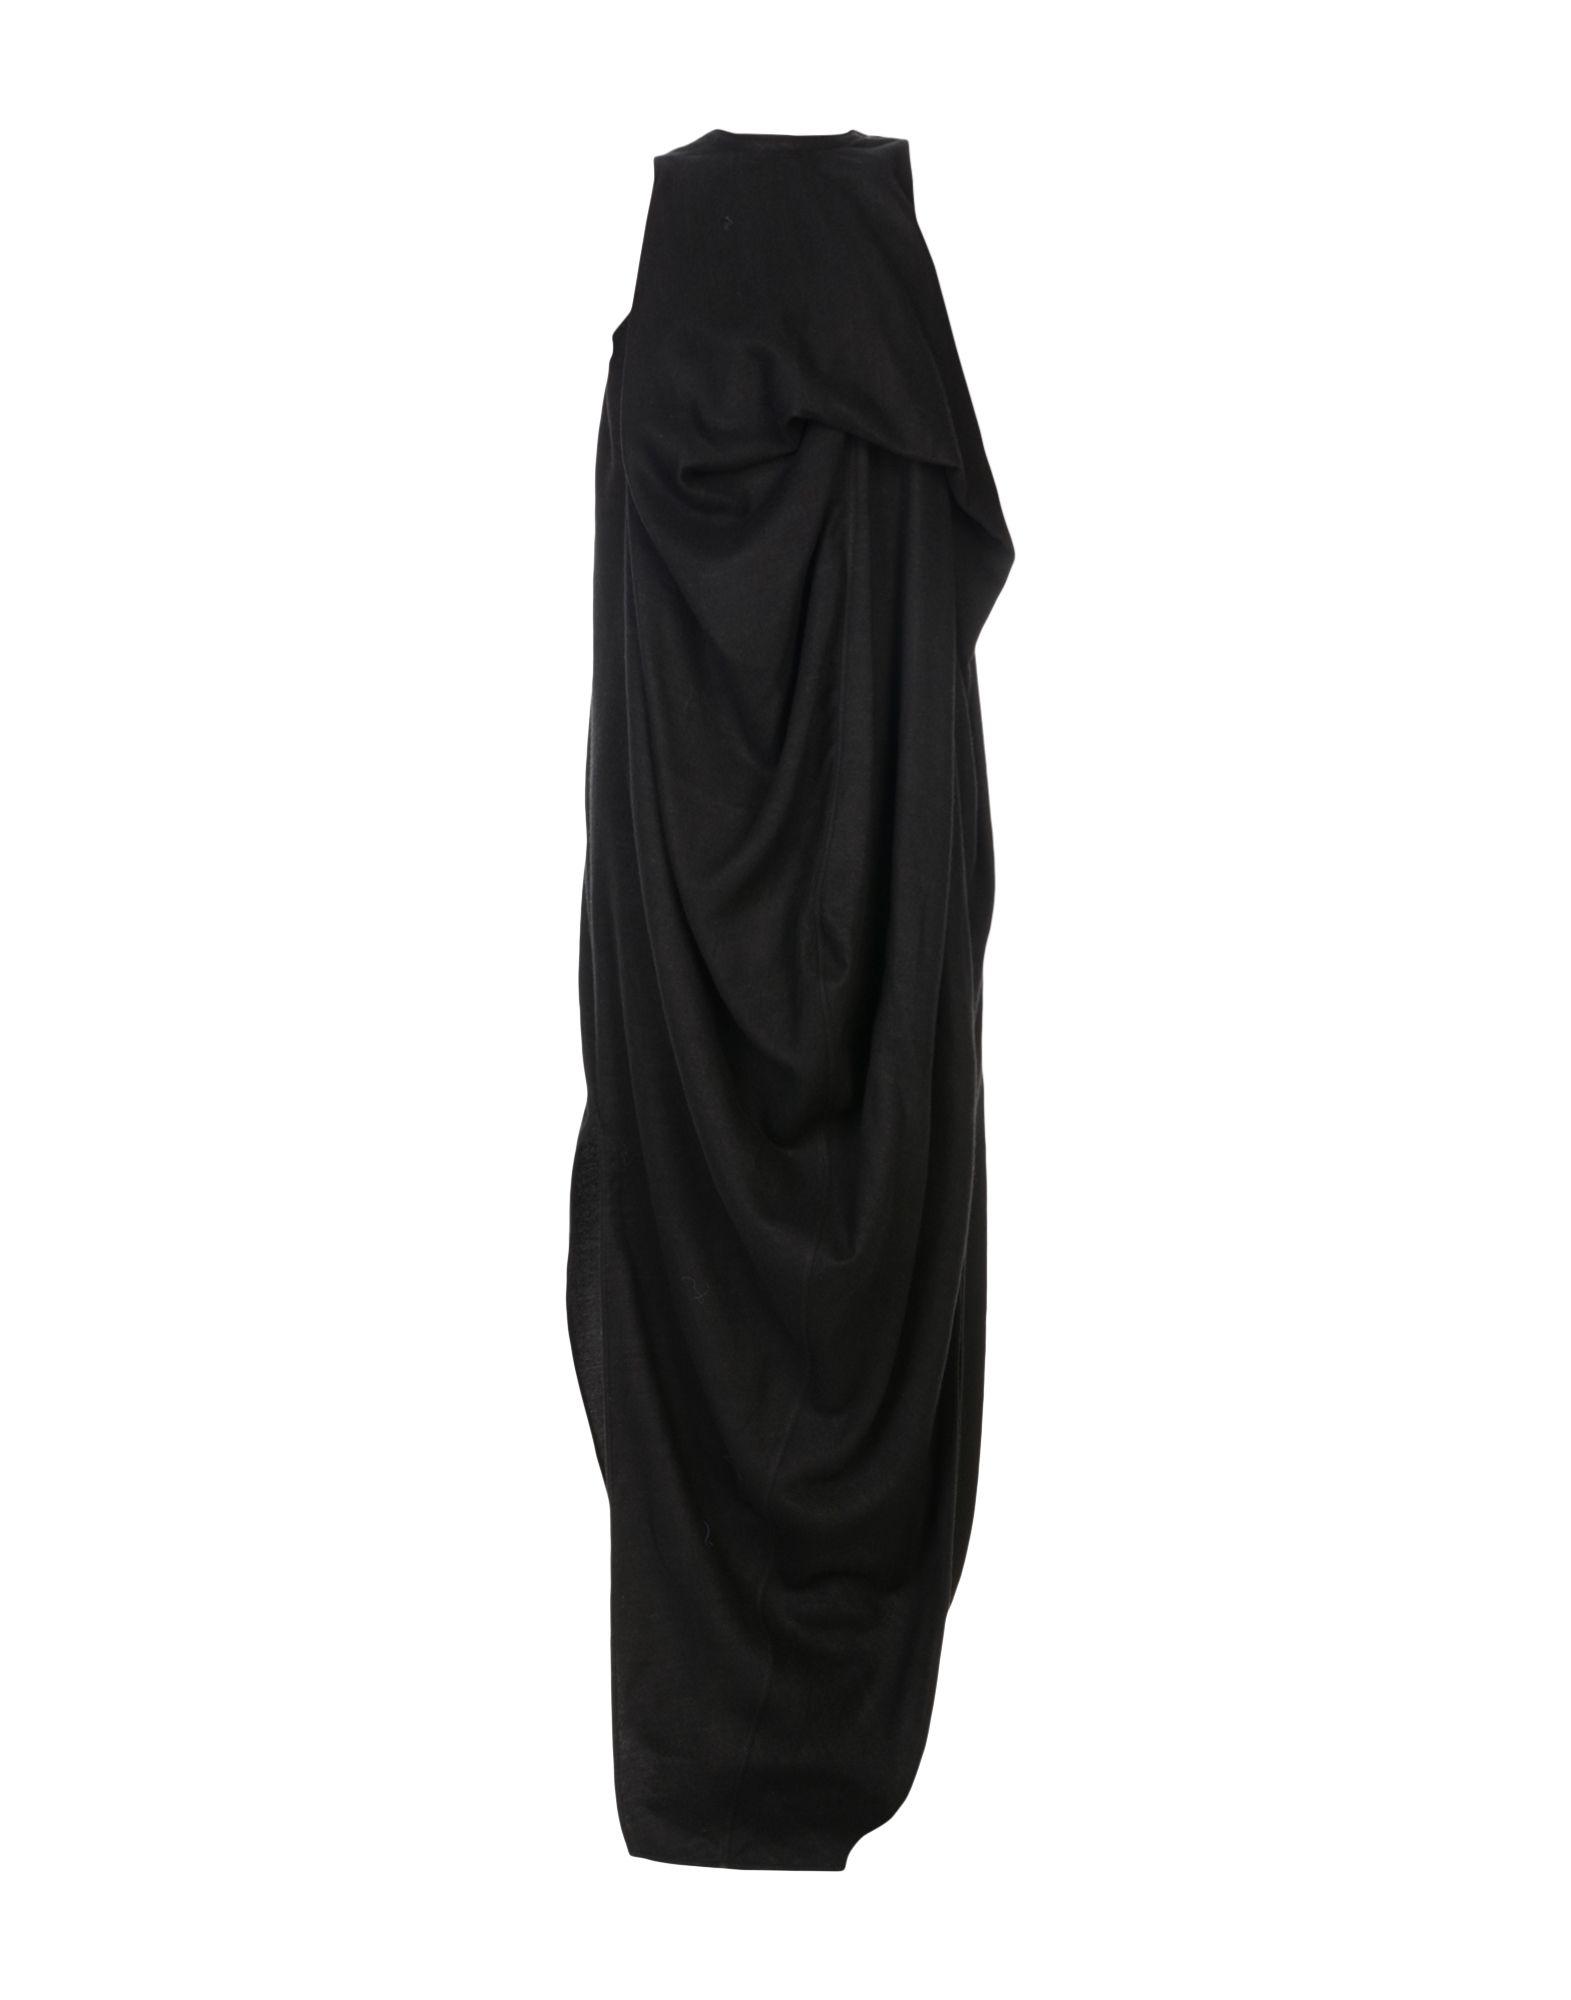 Vestito Lungo Rick Owens Donna - Acquista online su Sy7WXLj5p